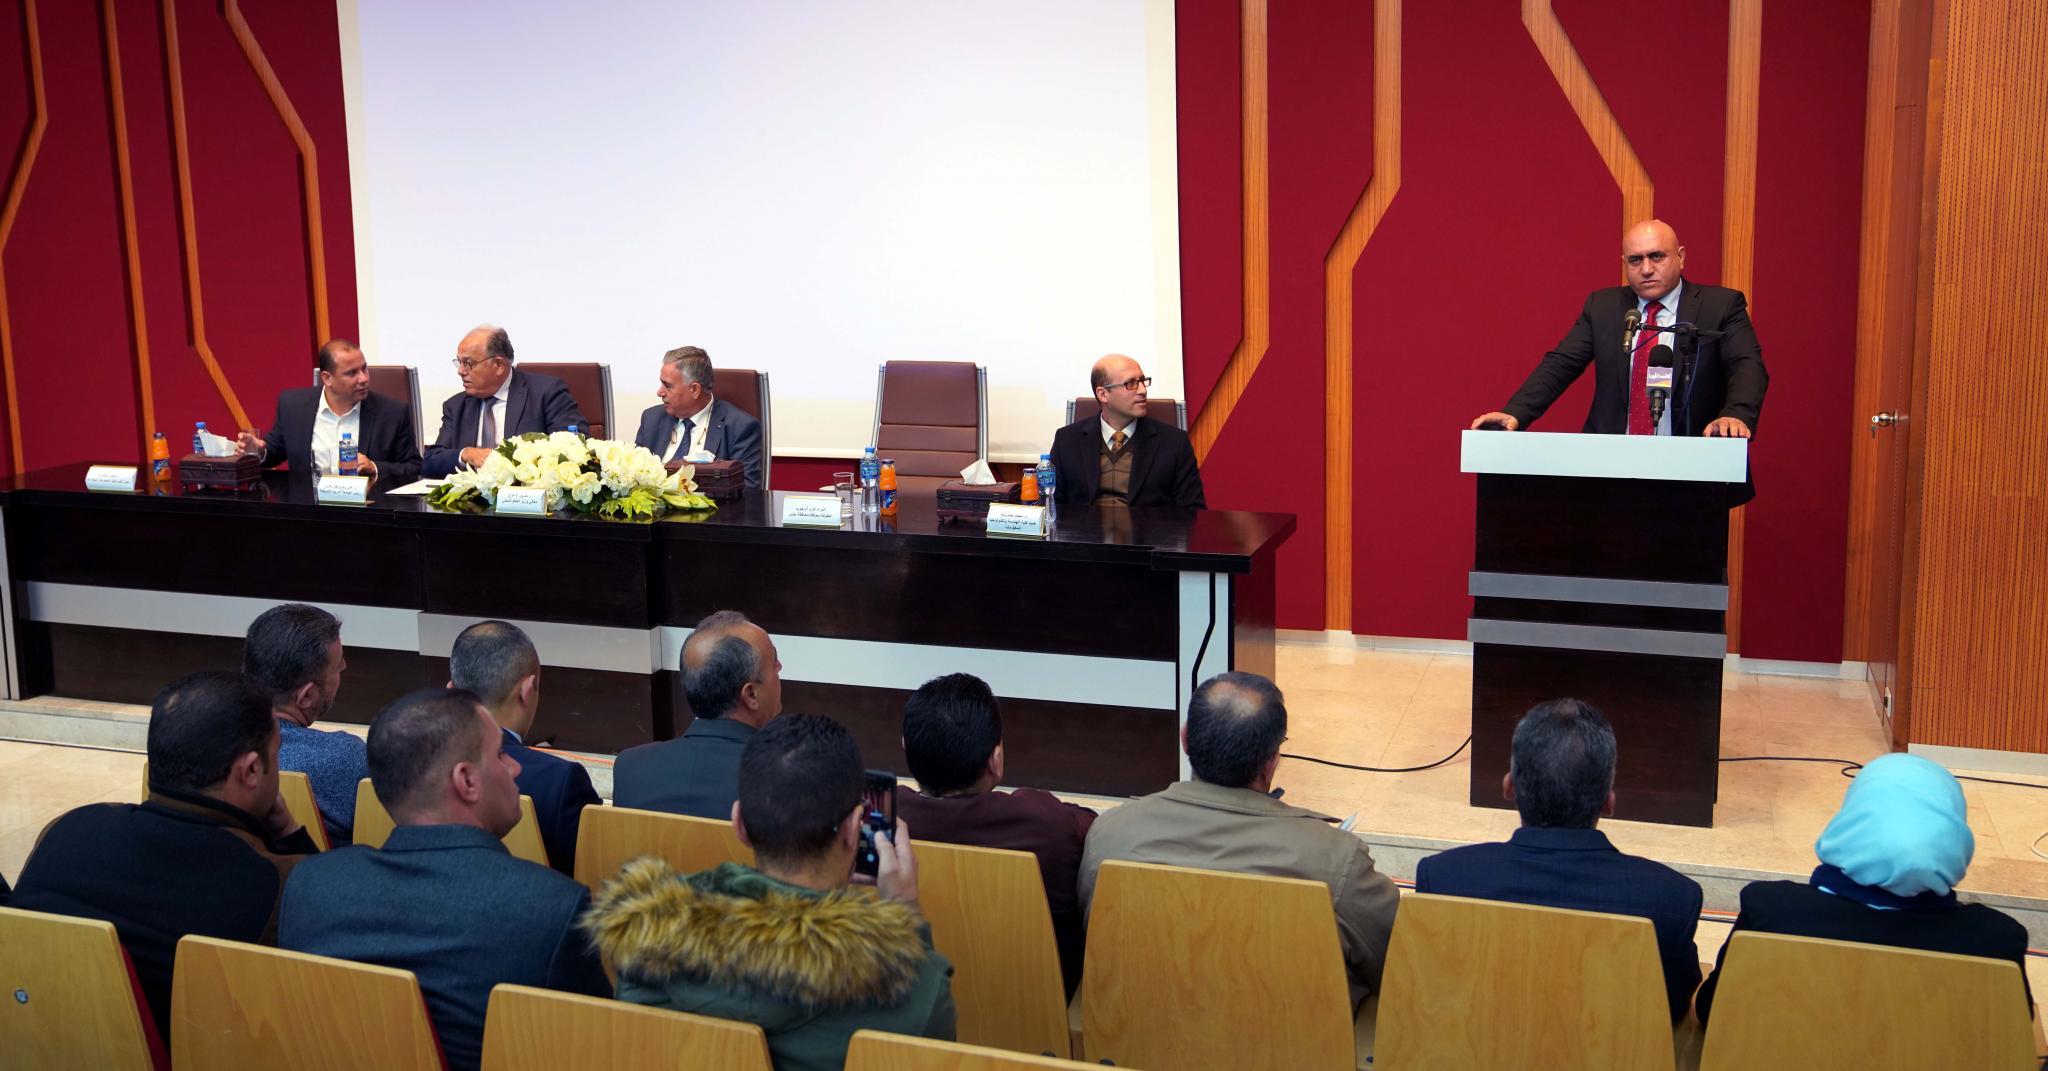 The Governor of Jenin speech